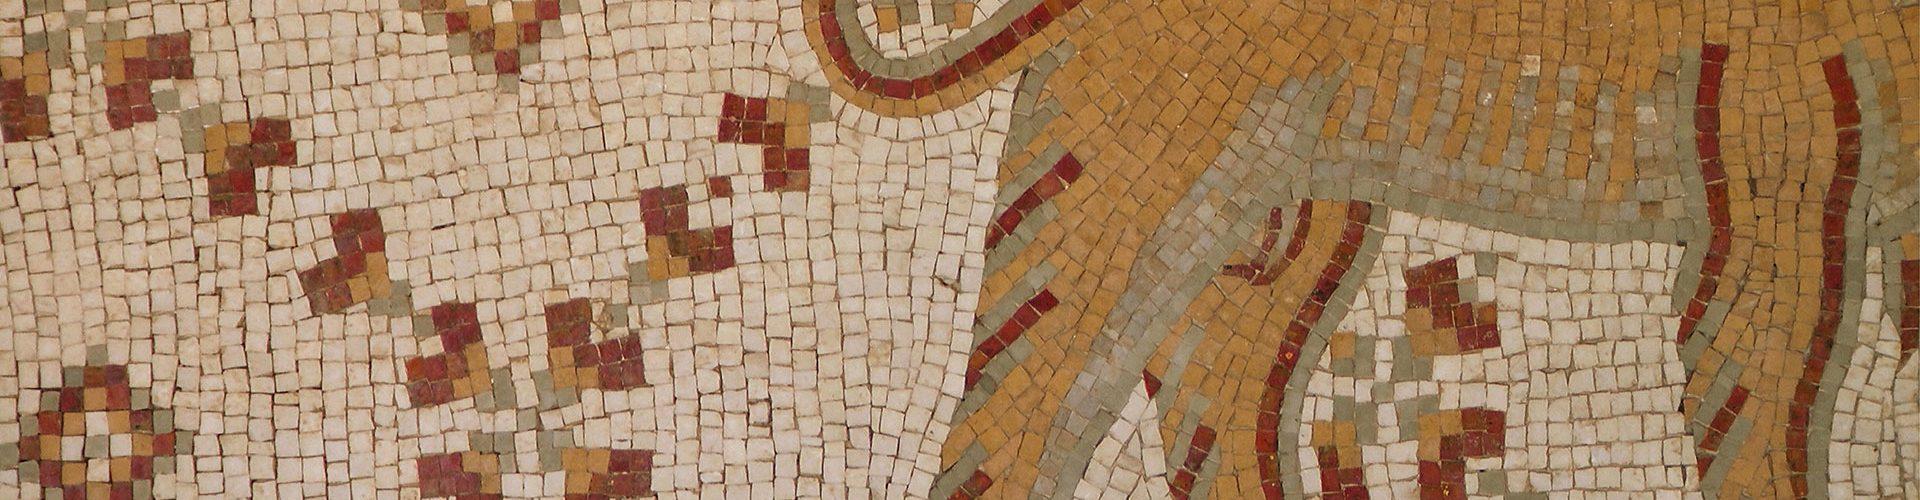 Madaba Mosaics Jordan 3 1920x500 - Viagem.Space